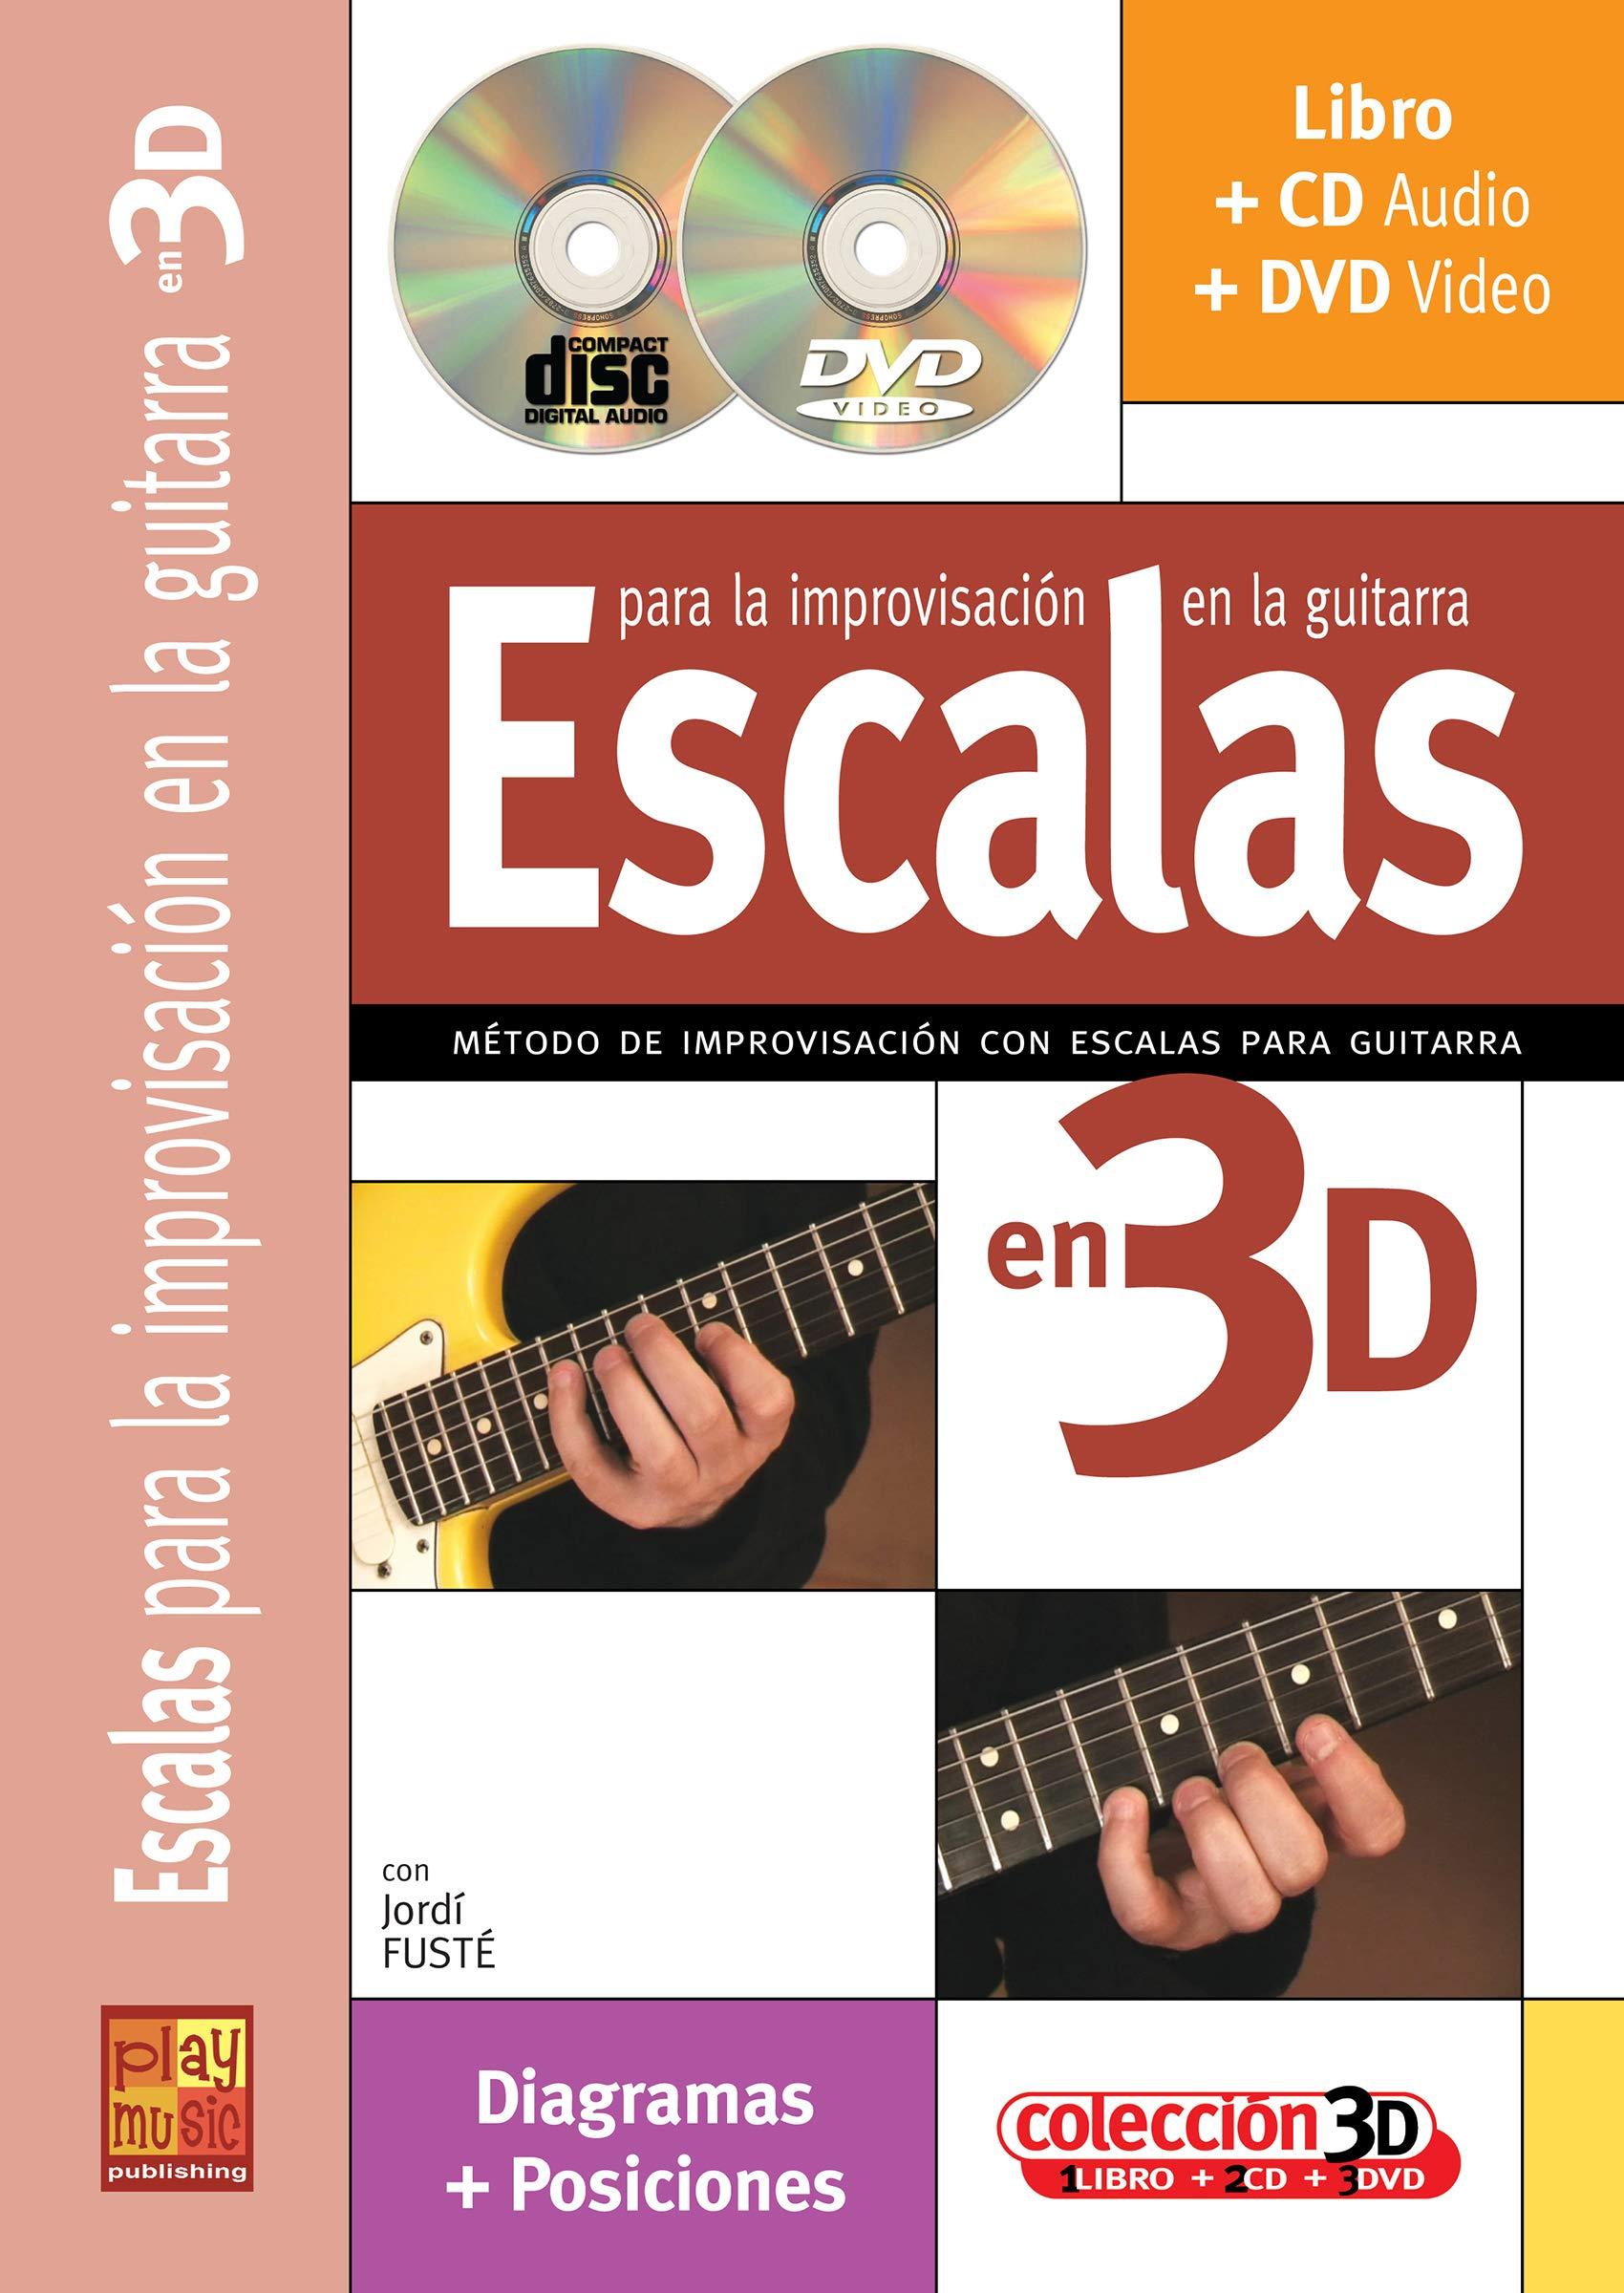 Escalas para la guitarra en 3D - 1 Libro + 1 CD + 1 DVD Play Music ...